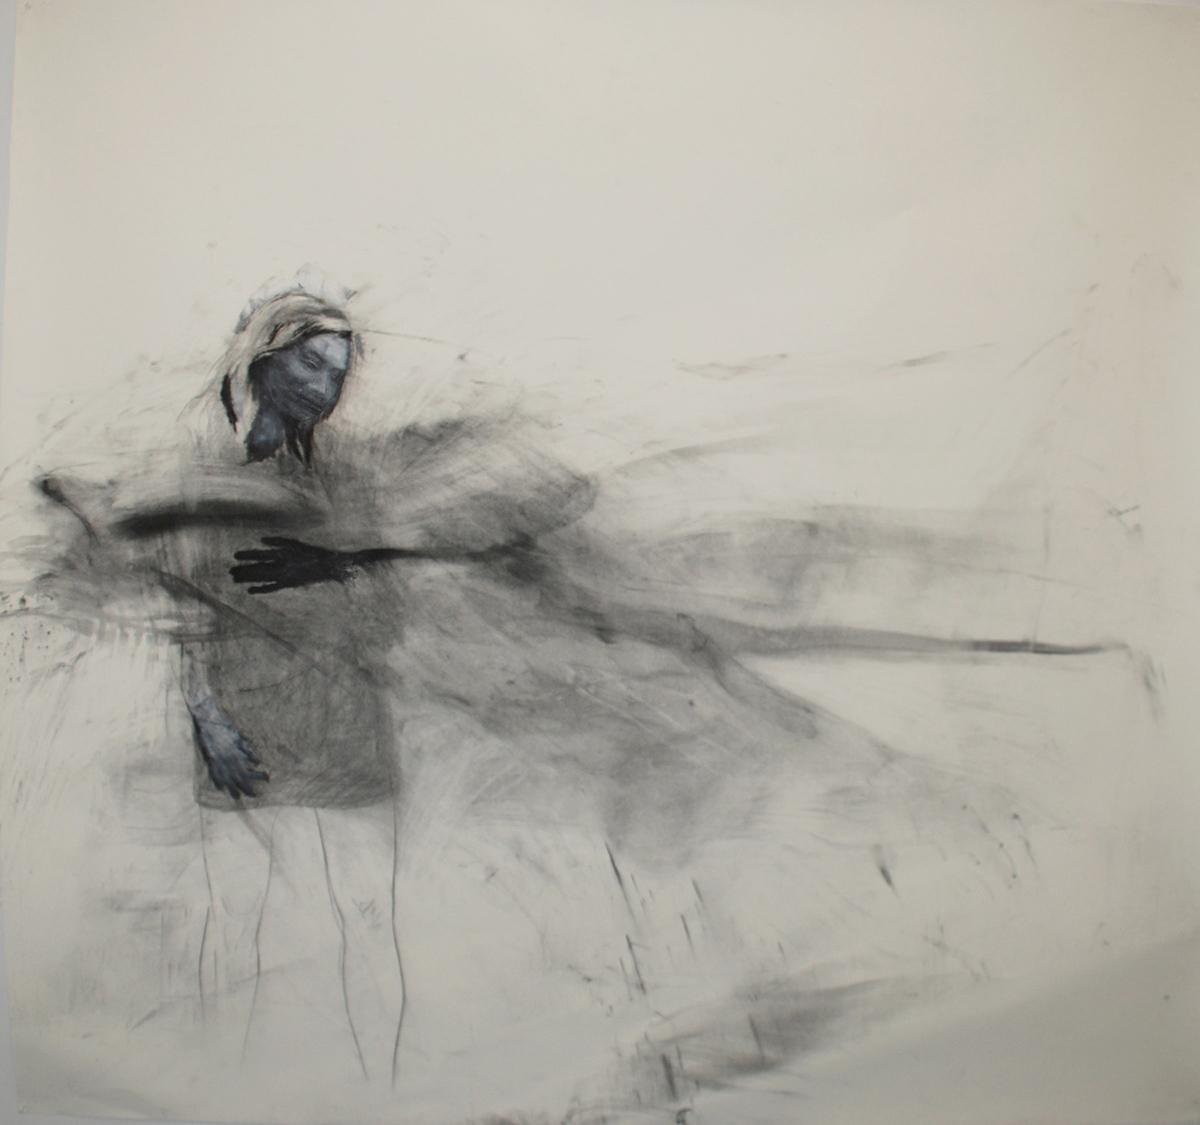 "Entropy / 84"" x 90"" / Oil pastel & charcoal on paper"